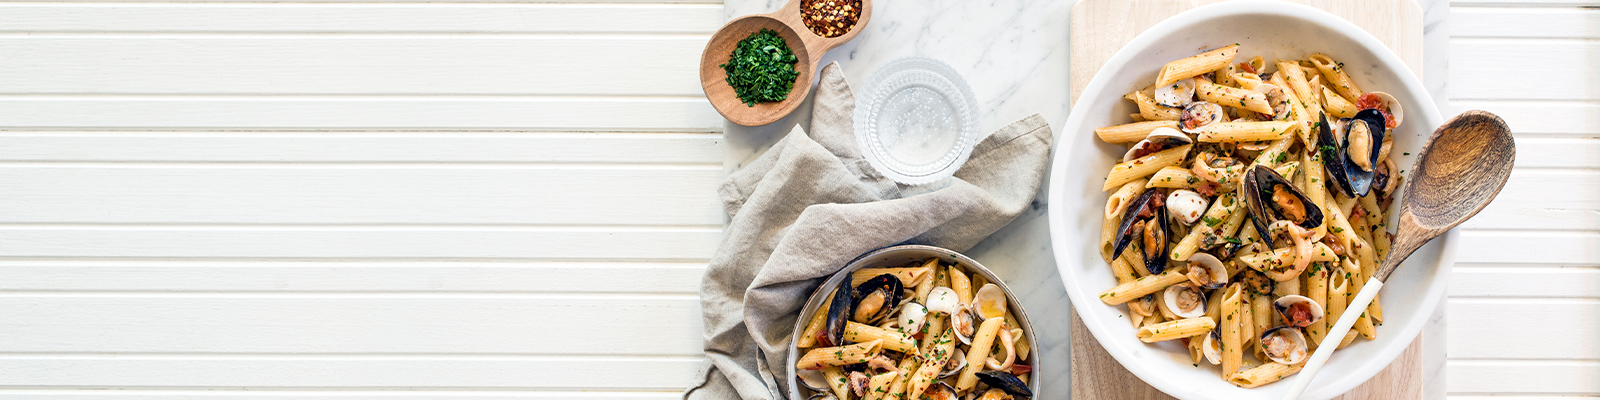 Pasta Garofalo - Receitas